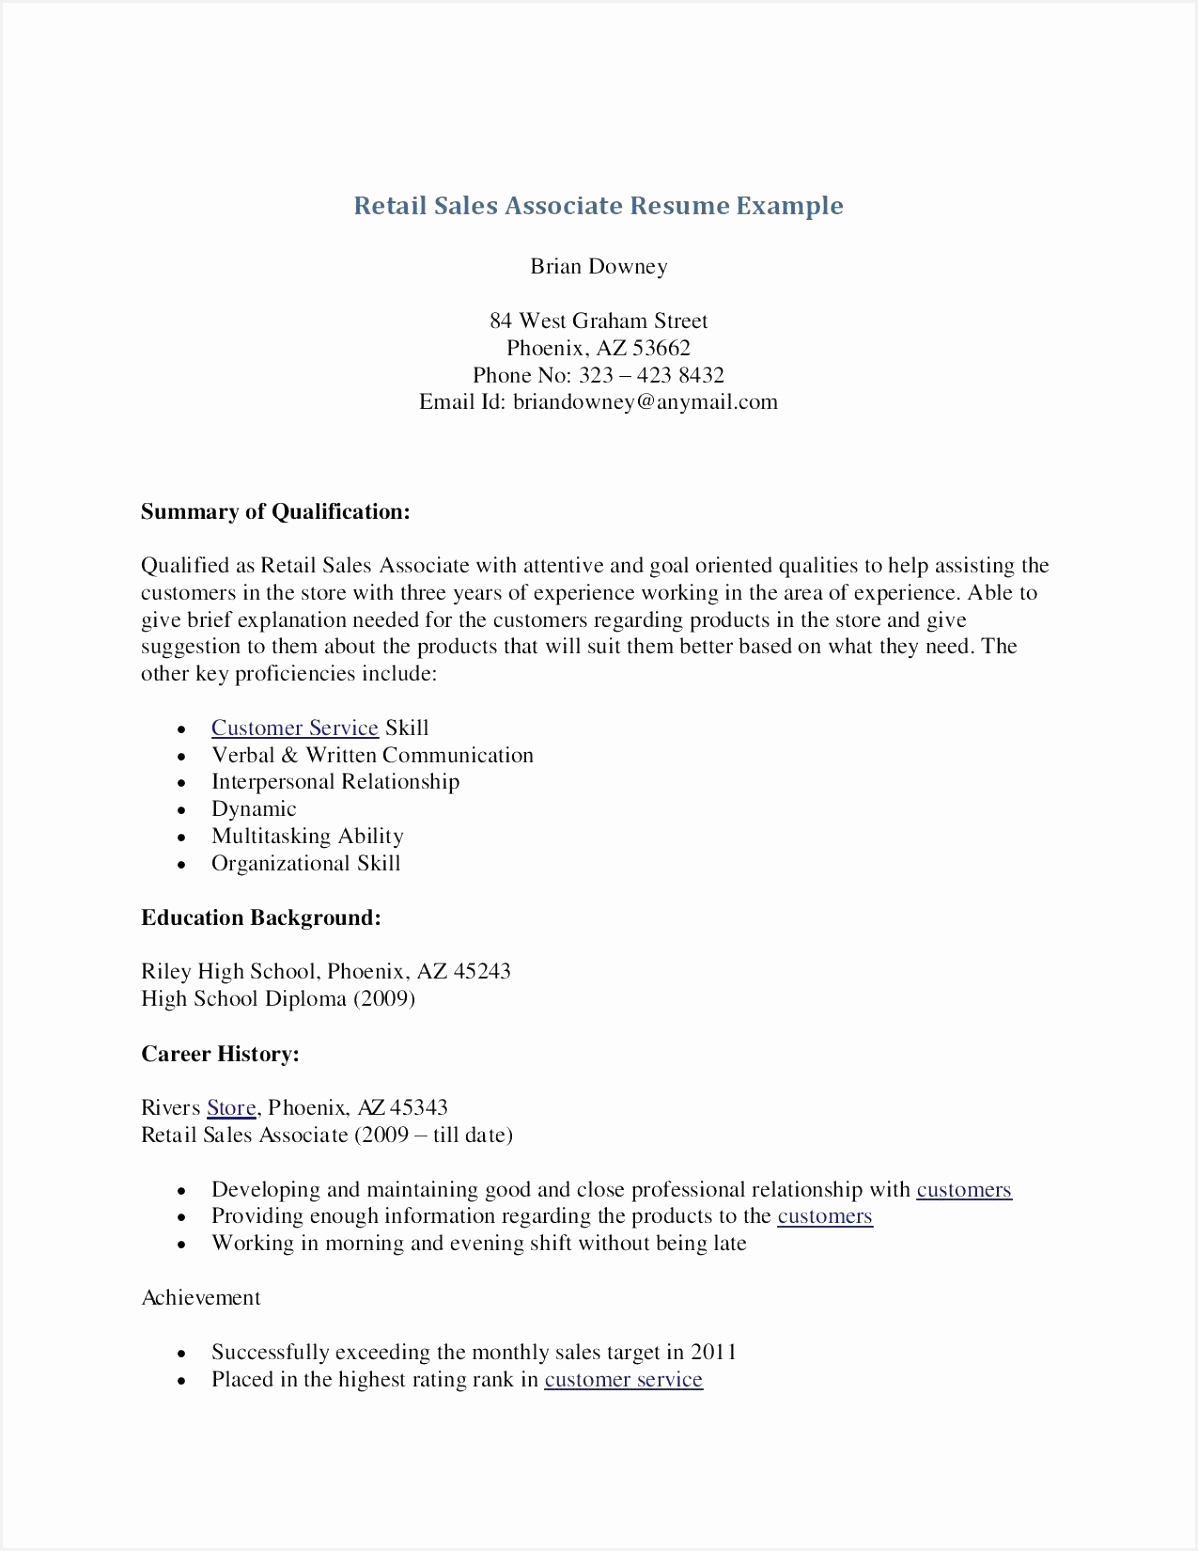 Sales associate Objective for Resume E3yfg Fresh Cover Letter for Retail Sales associate Of 7 Sales associate Objective for Resume